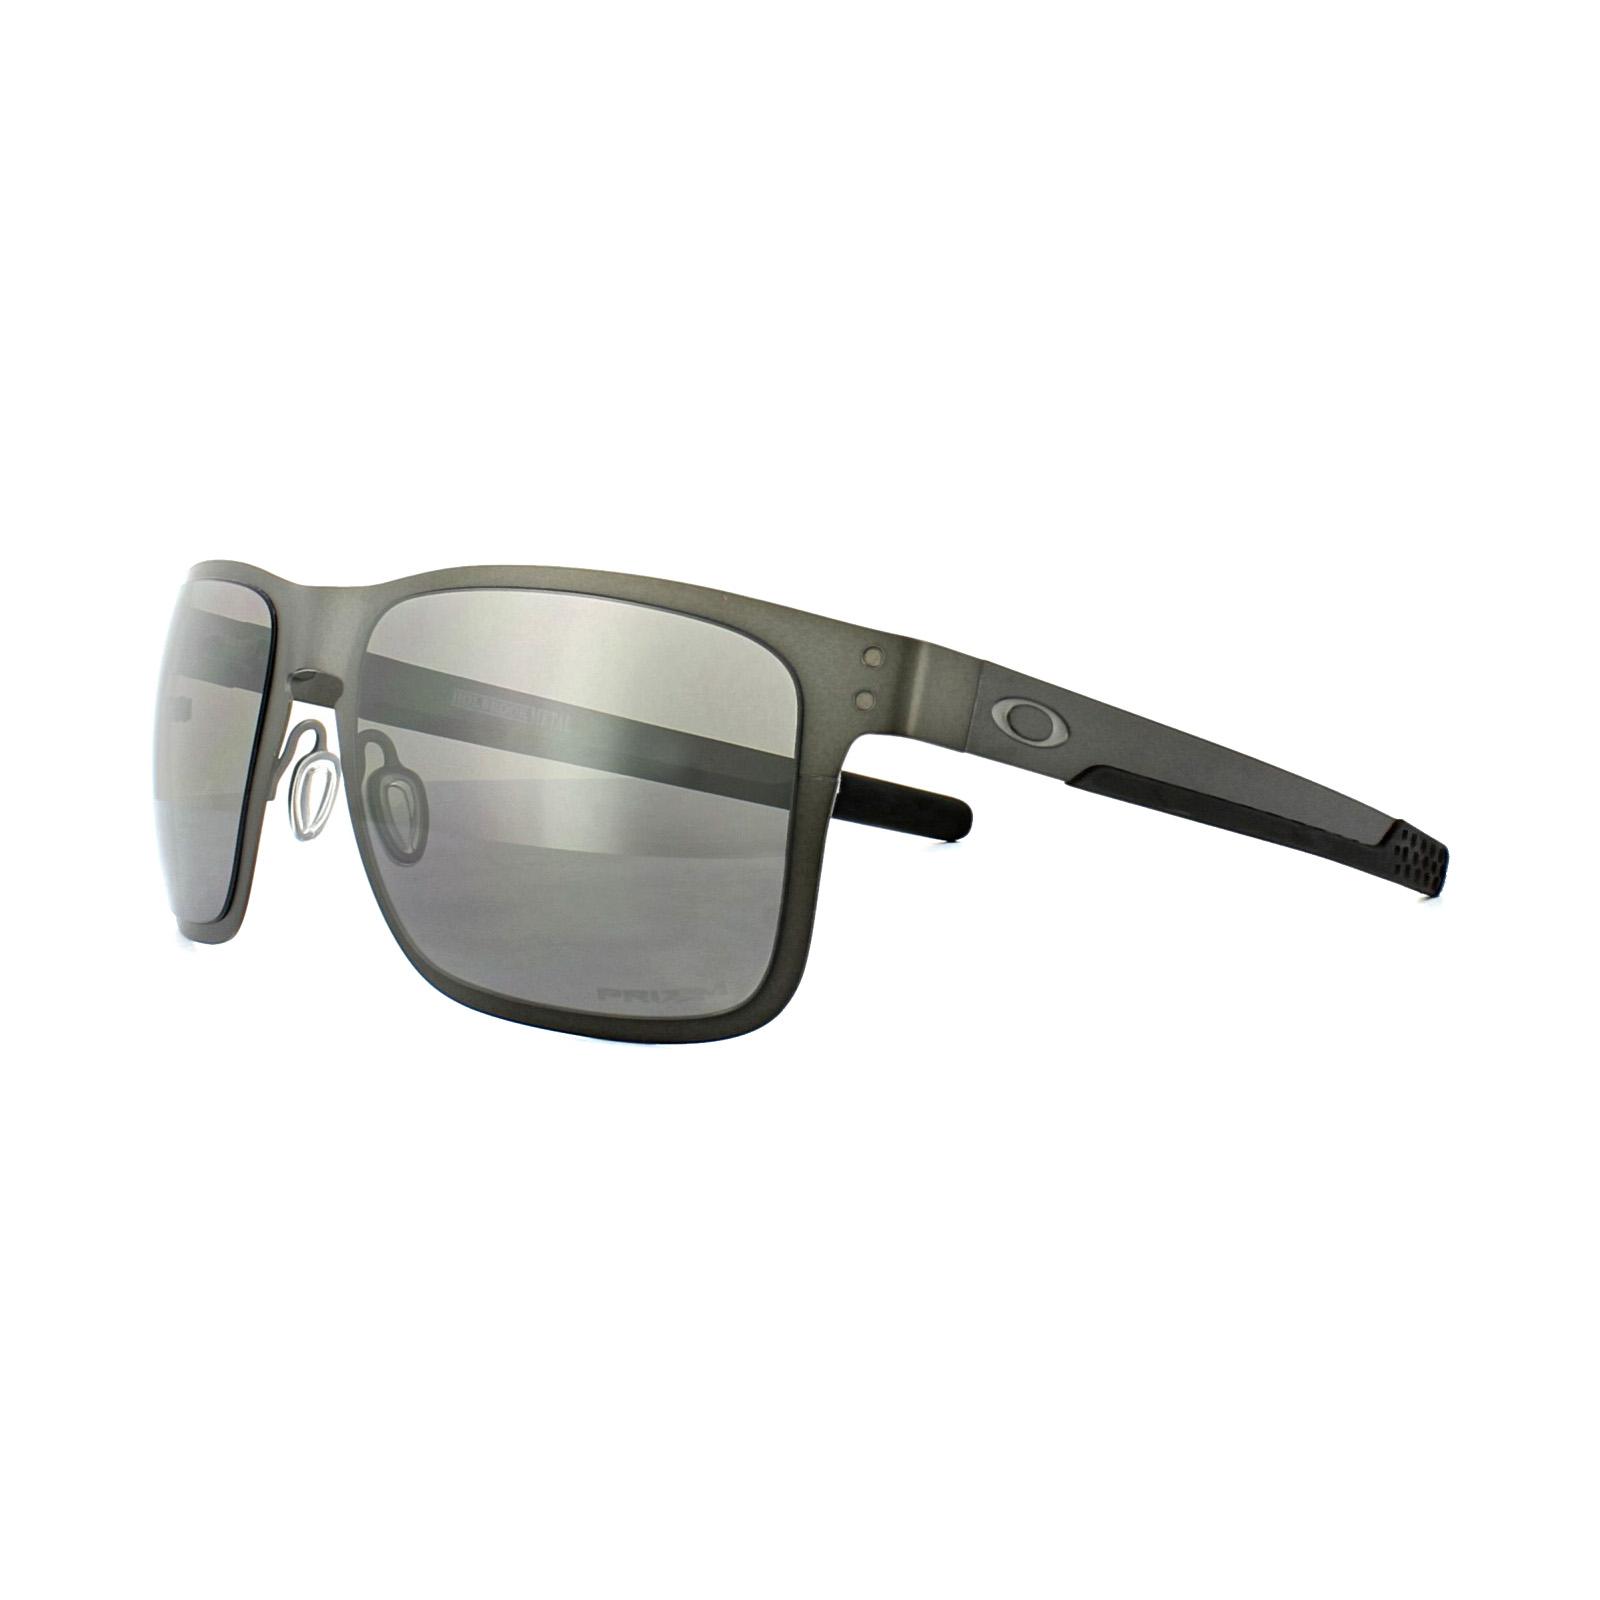 Sentinel Oakley Sunglasses Holbrook Metal OO4123-06 Matt Gunmetal Prizm  Black Polarized 0944c4db369